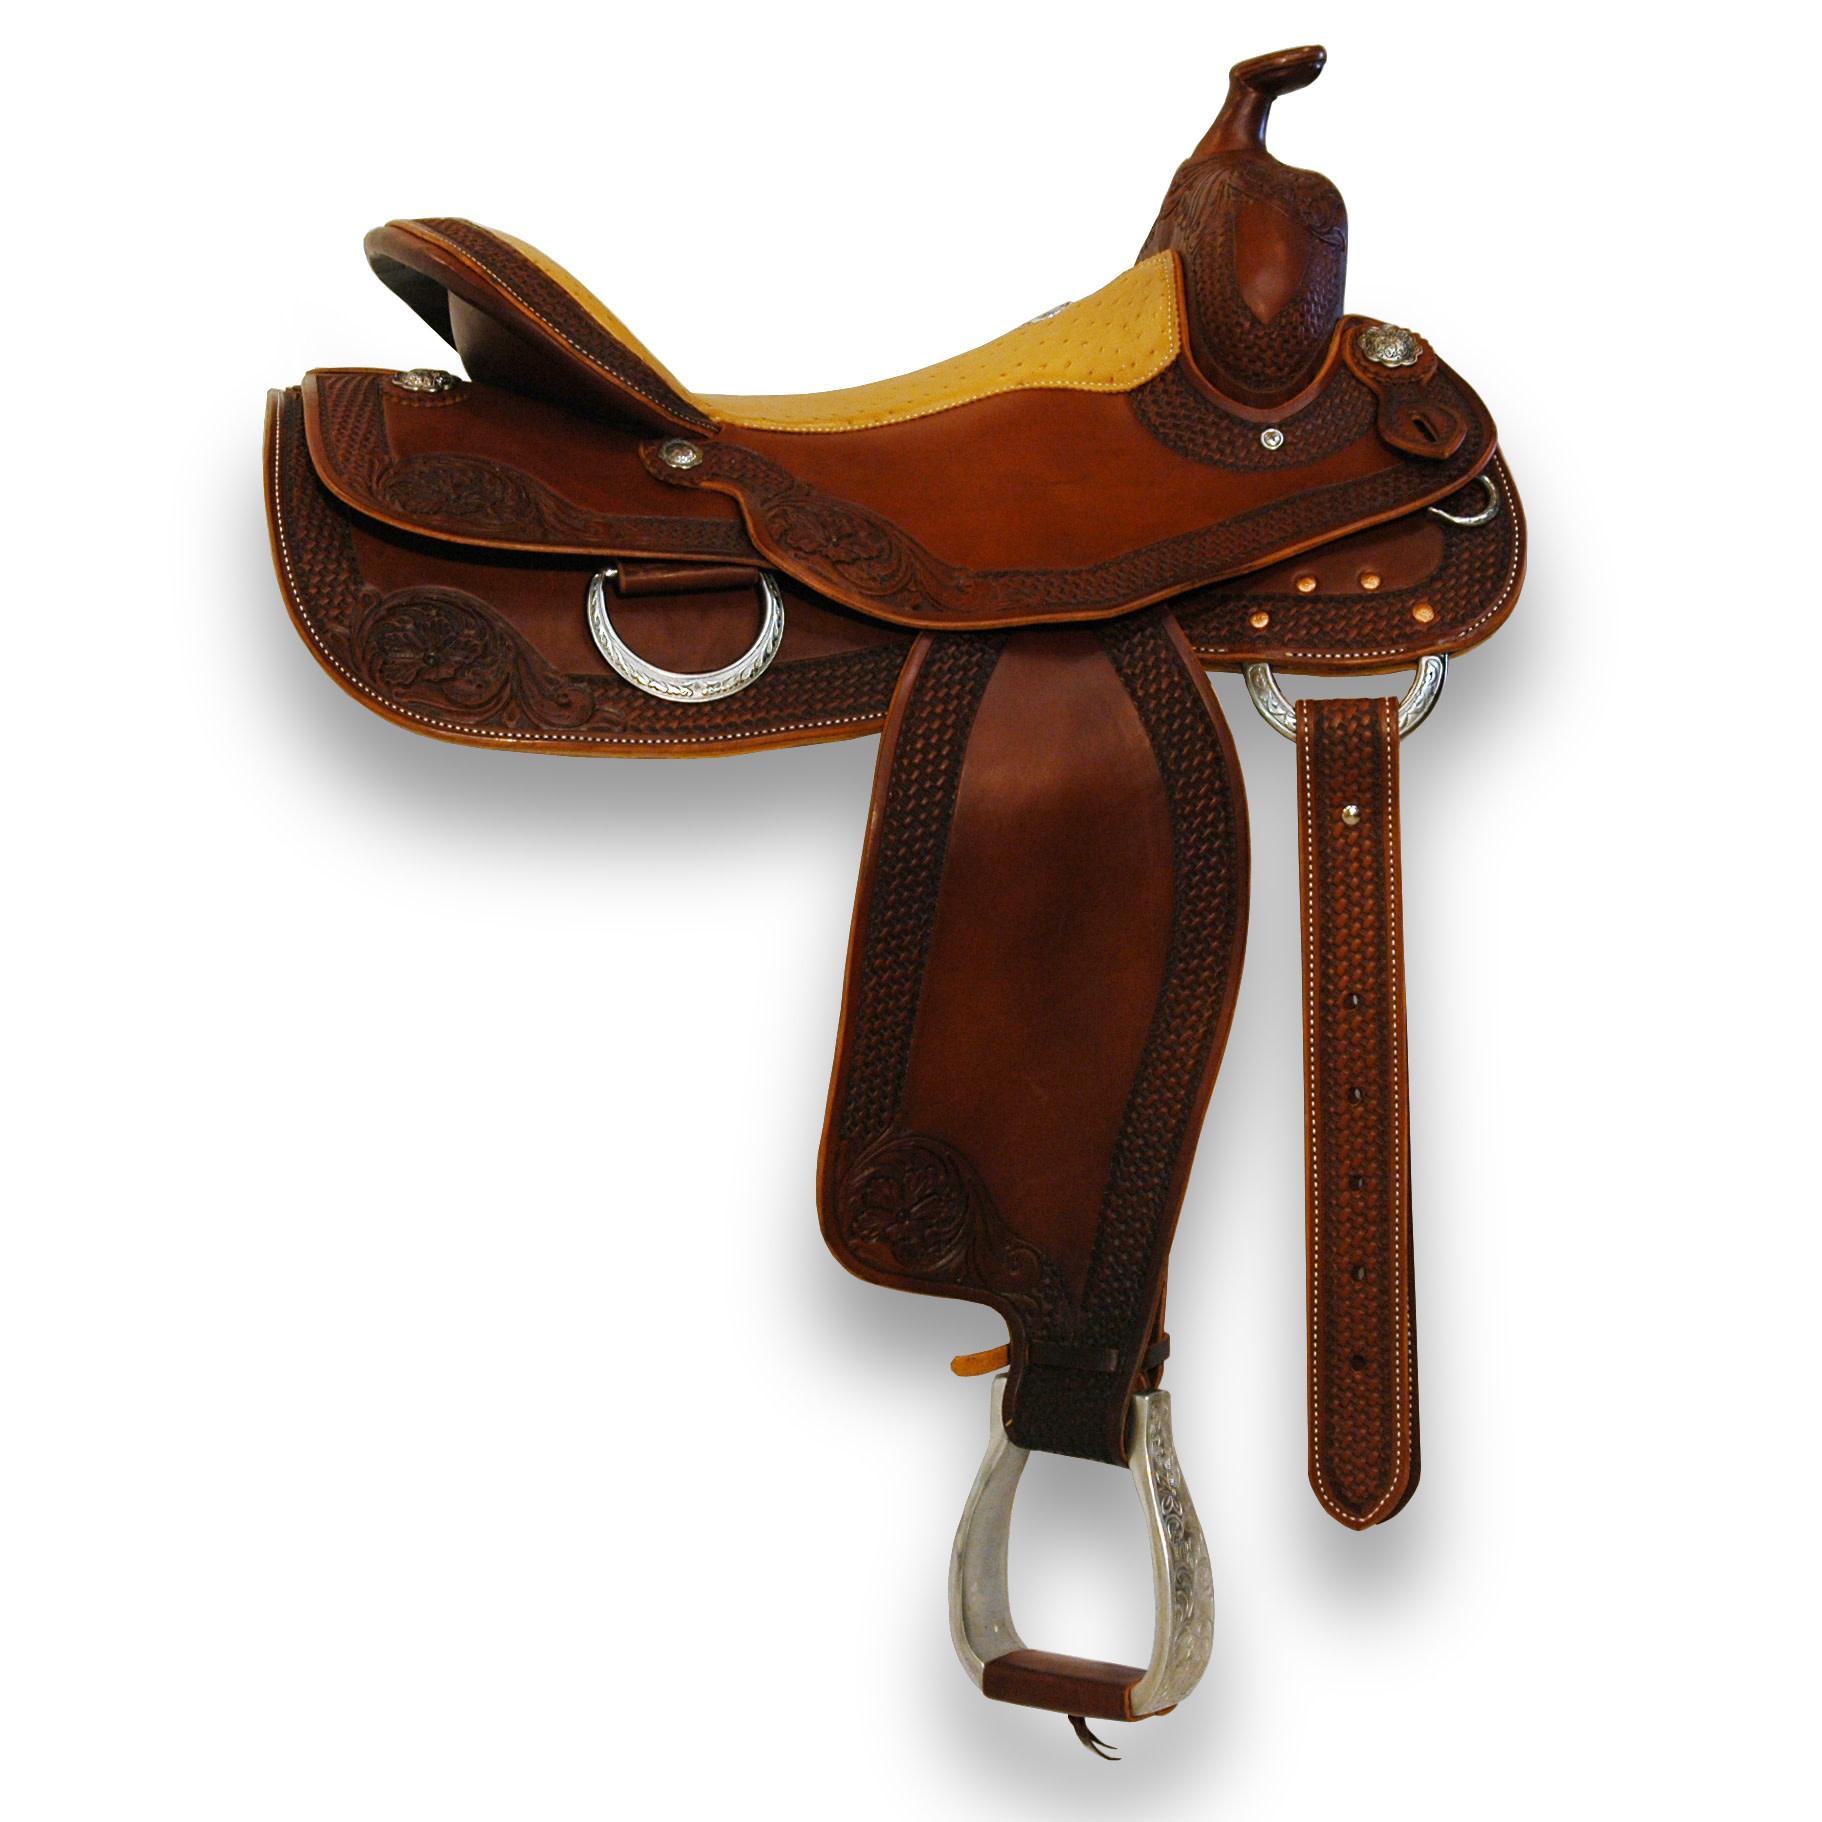 Ranchman Ranchman example saddle 9